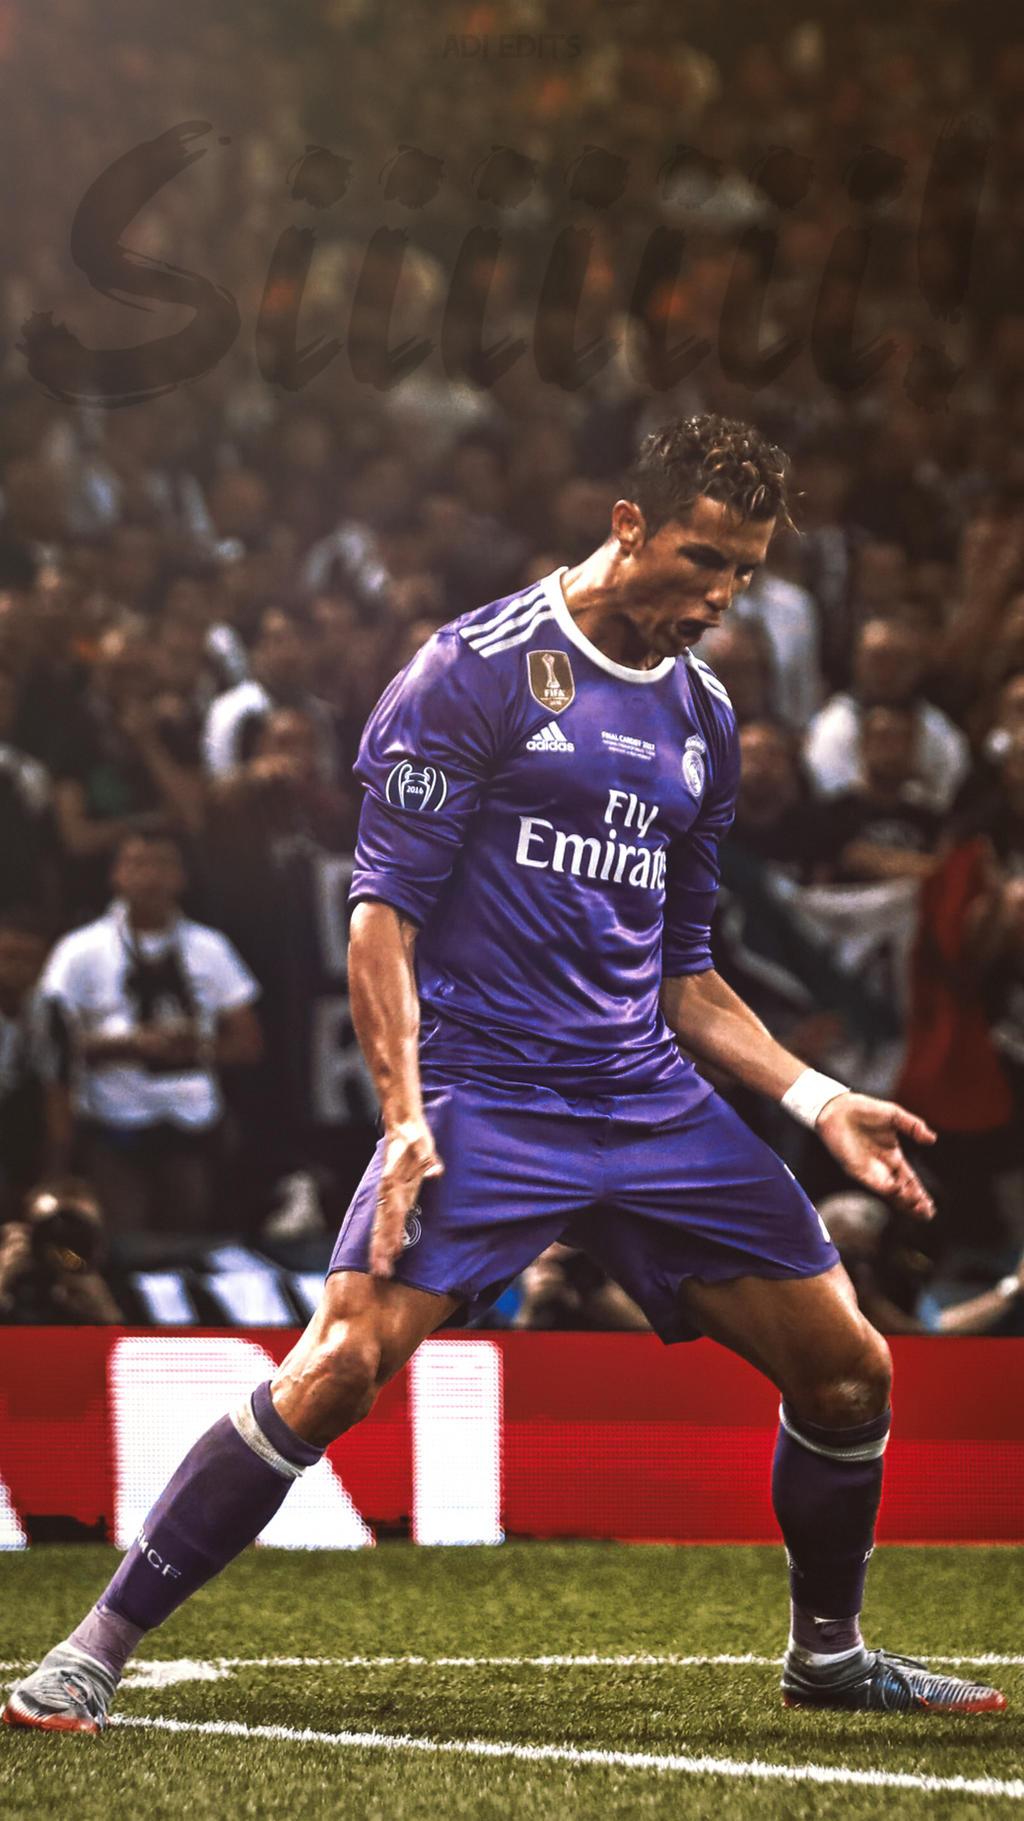 Cristiano Ronaldo Real Madrid Iphone Wallpaper Hd By Adi 149 On Deviantart